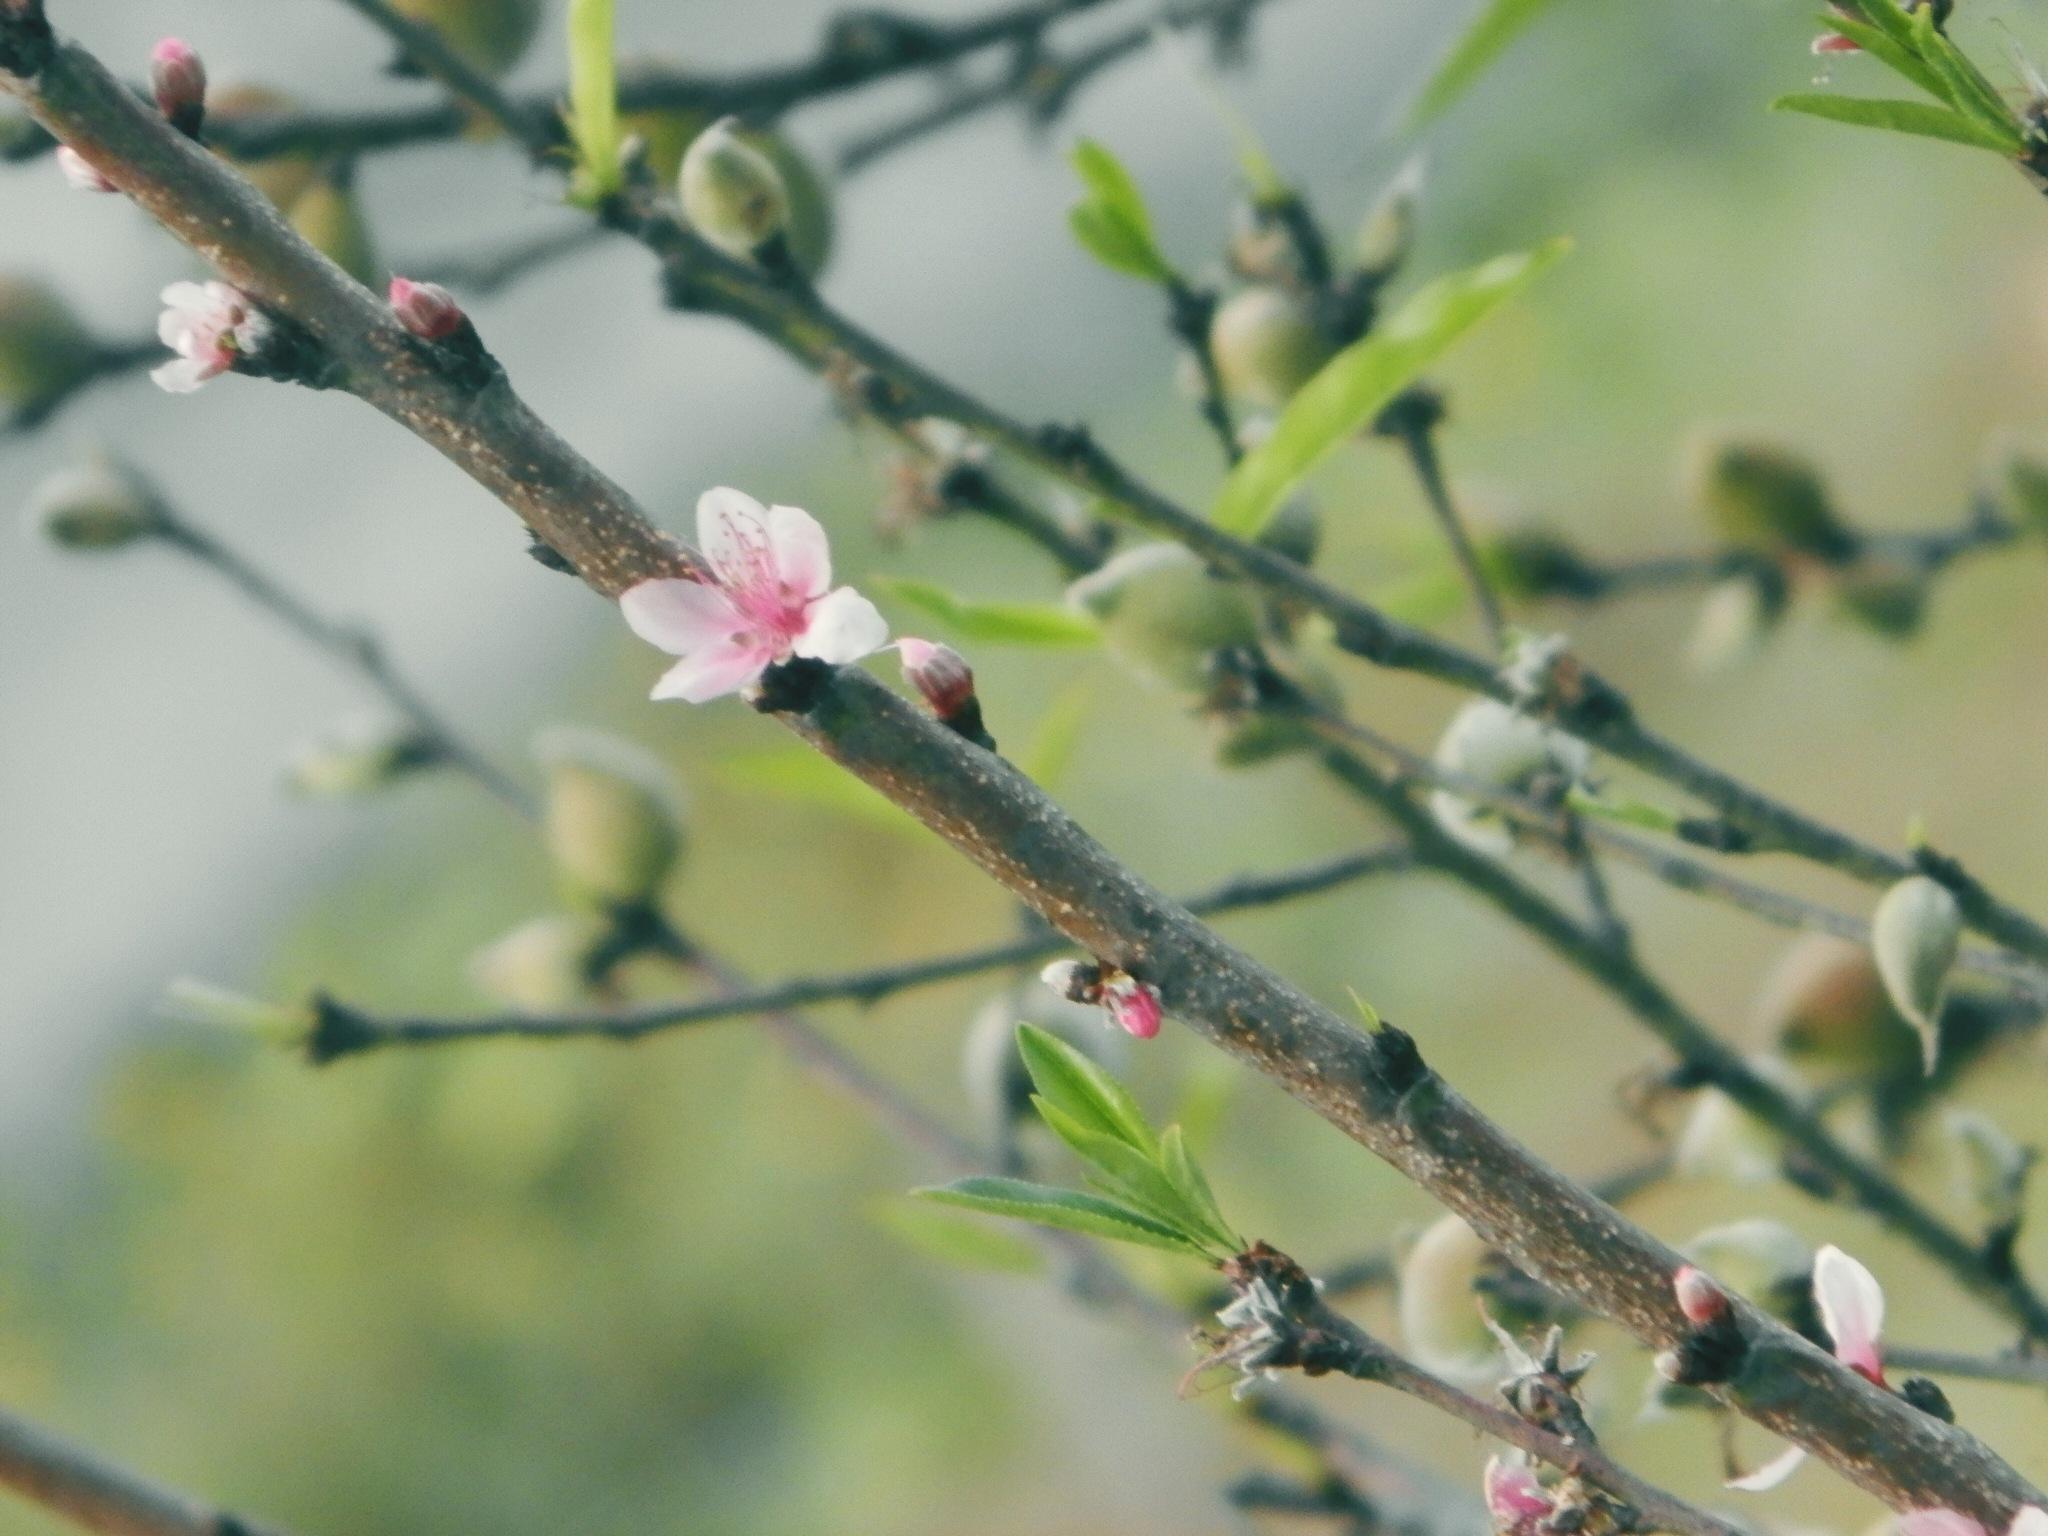 Peach tree flower by Iosef_William